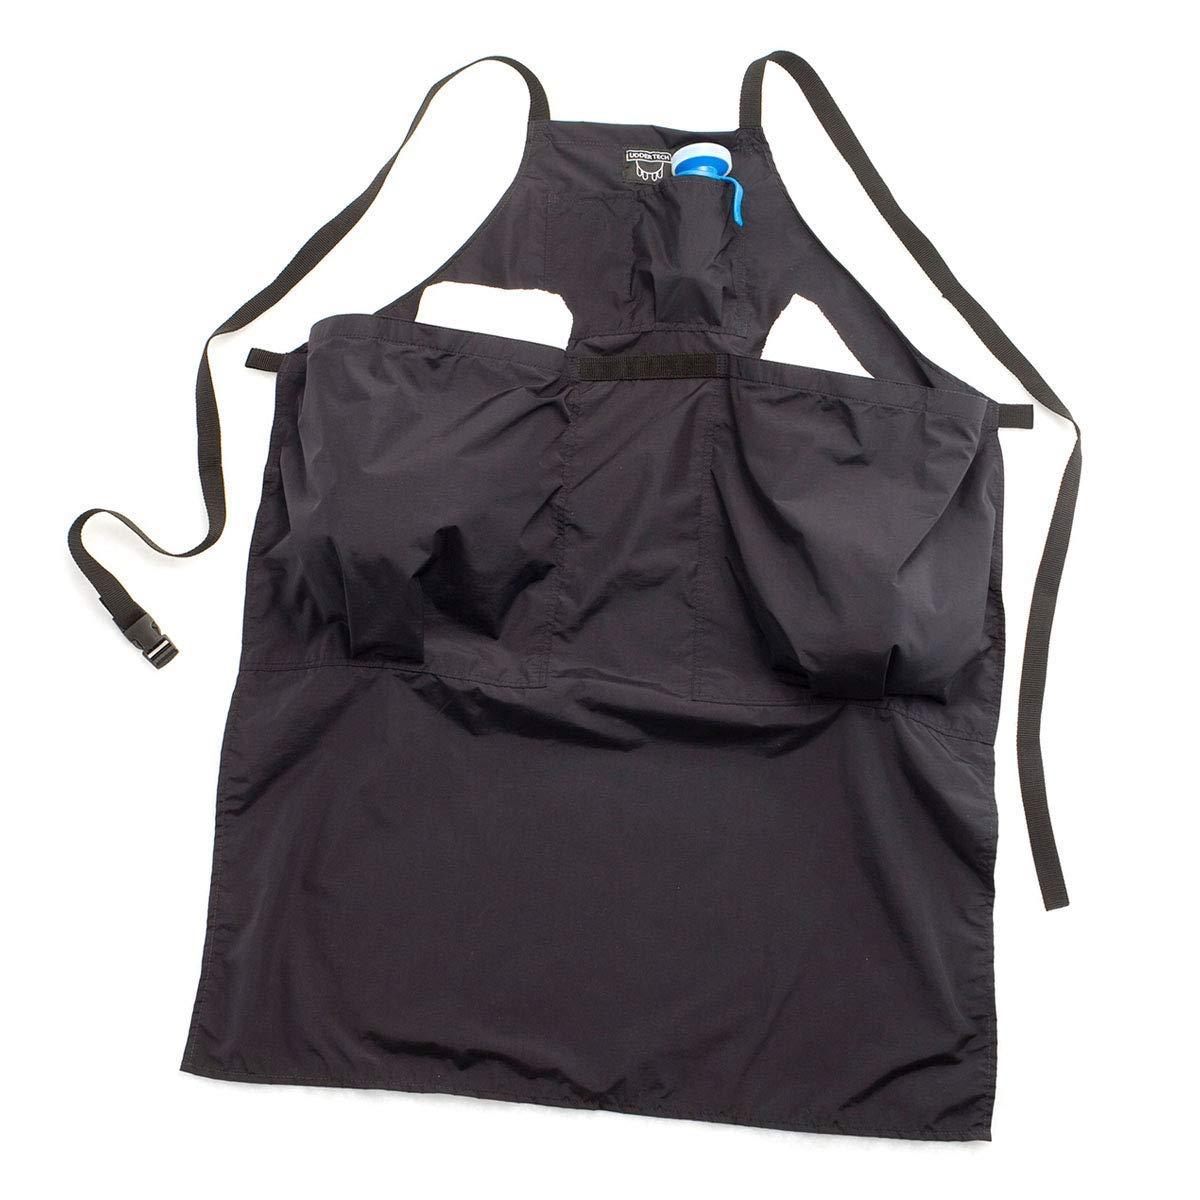 Waterproof Cloth Towel Apron, Large, 2-Pocket, Black by Udder Tech